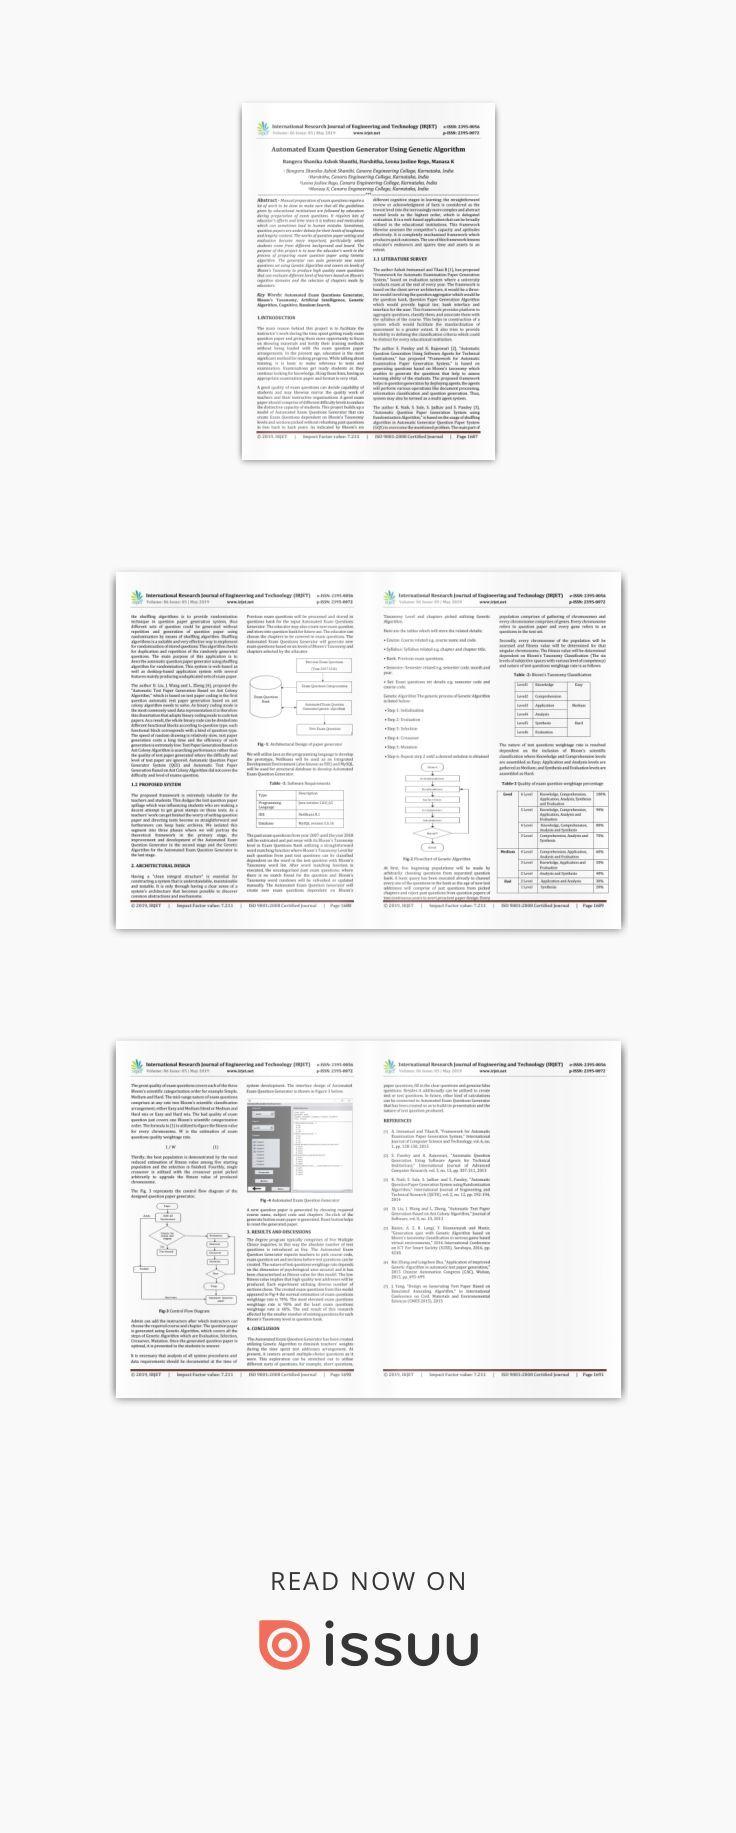 IRJET Automated Exam Question Generator using